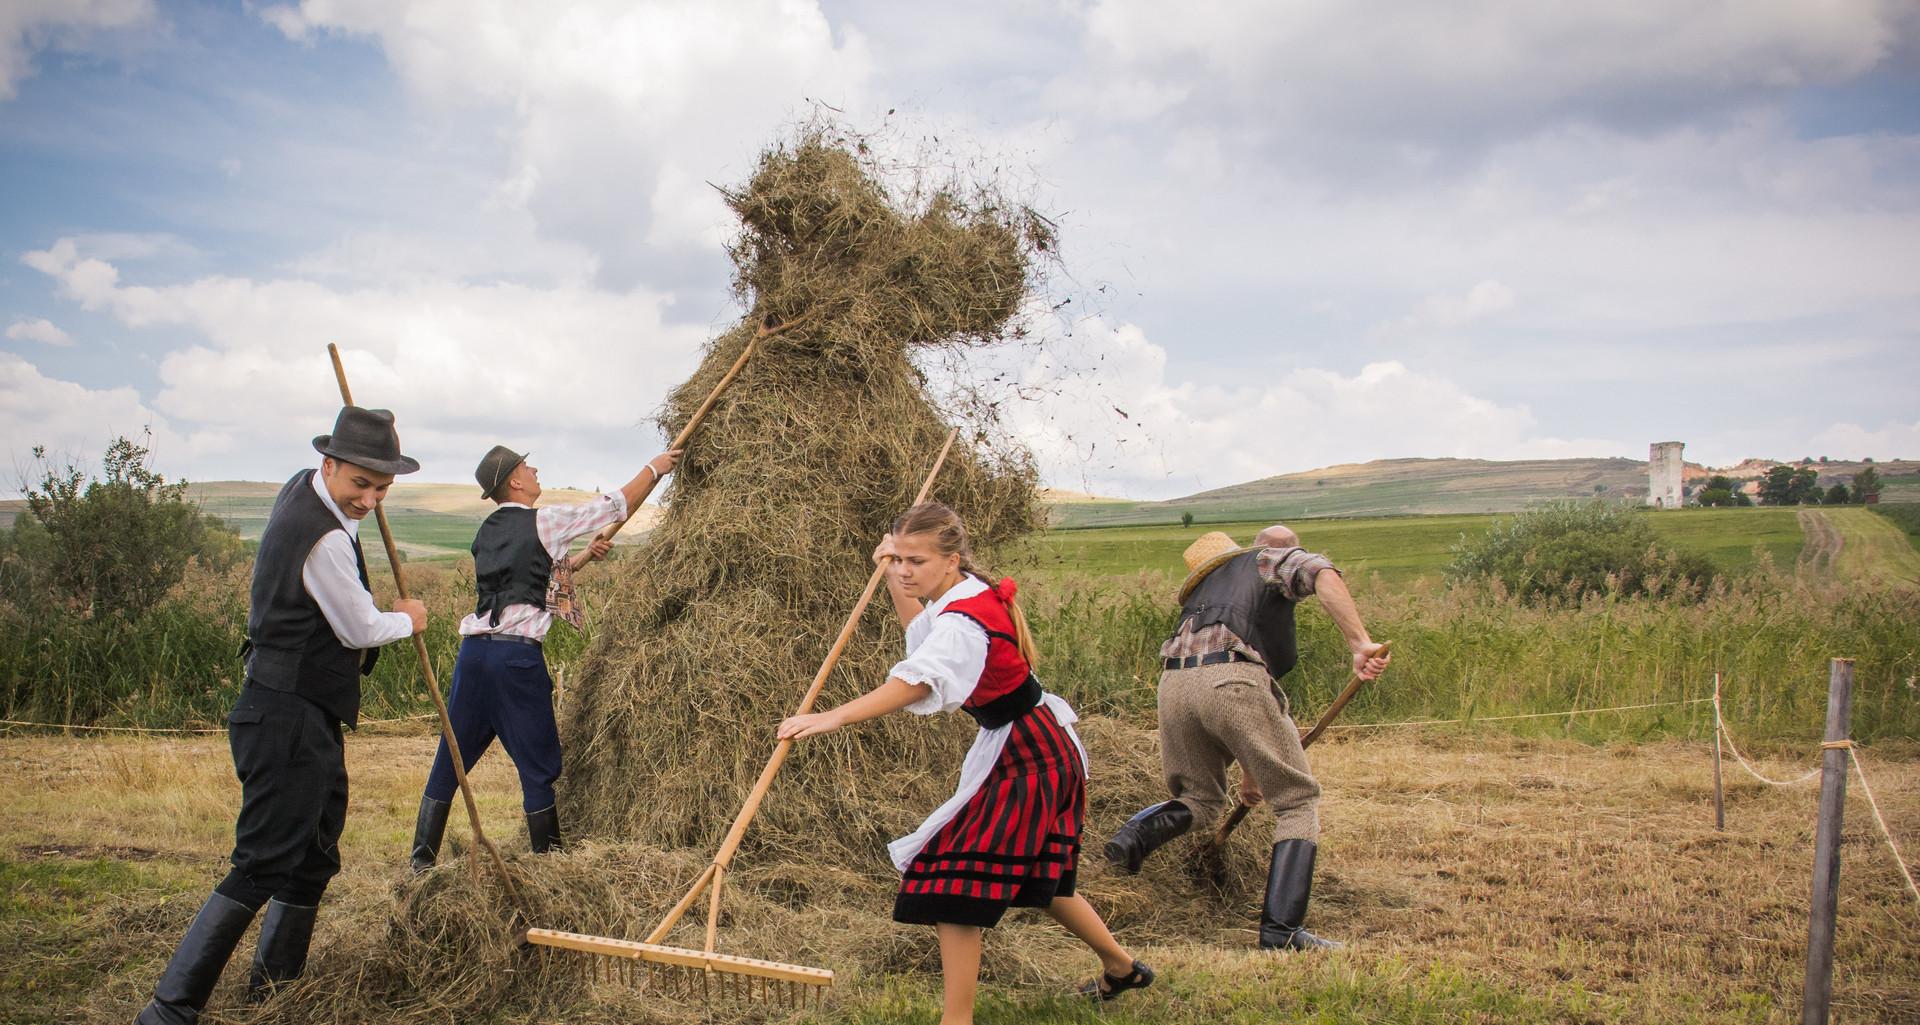 Csíkszenttamás / Tomeșt Harghita county / Hargita megye / Județul Harghita Romania / Románia / România 2016